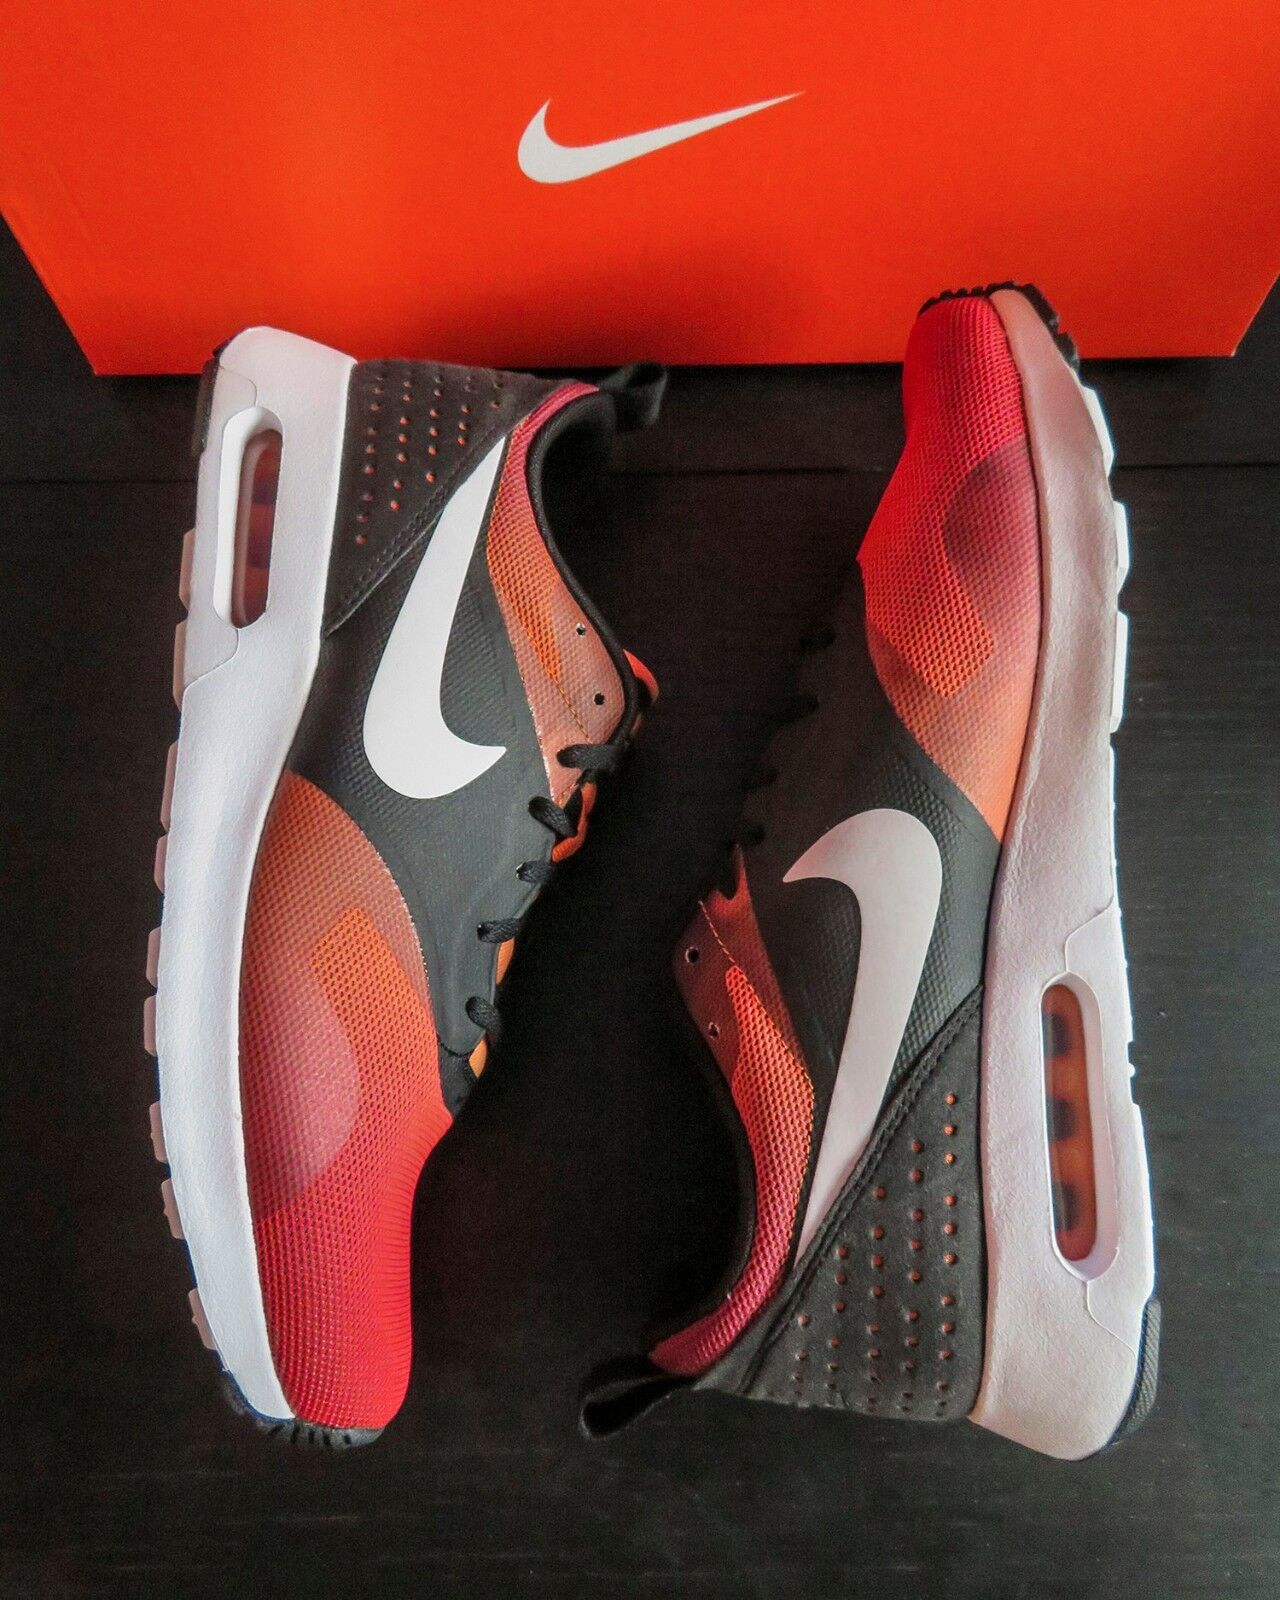 Nike air max tavas impronta Uomo 742782 008 taglia 9 bianco nero brillante mandarino